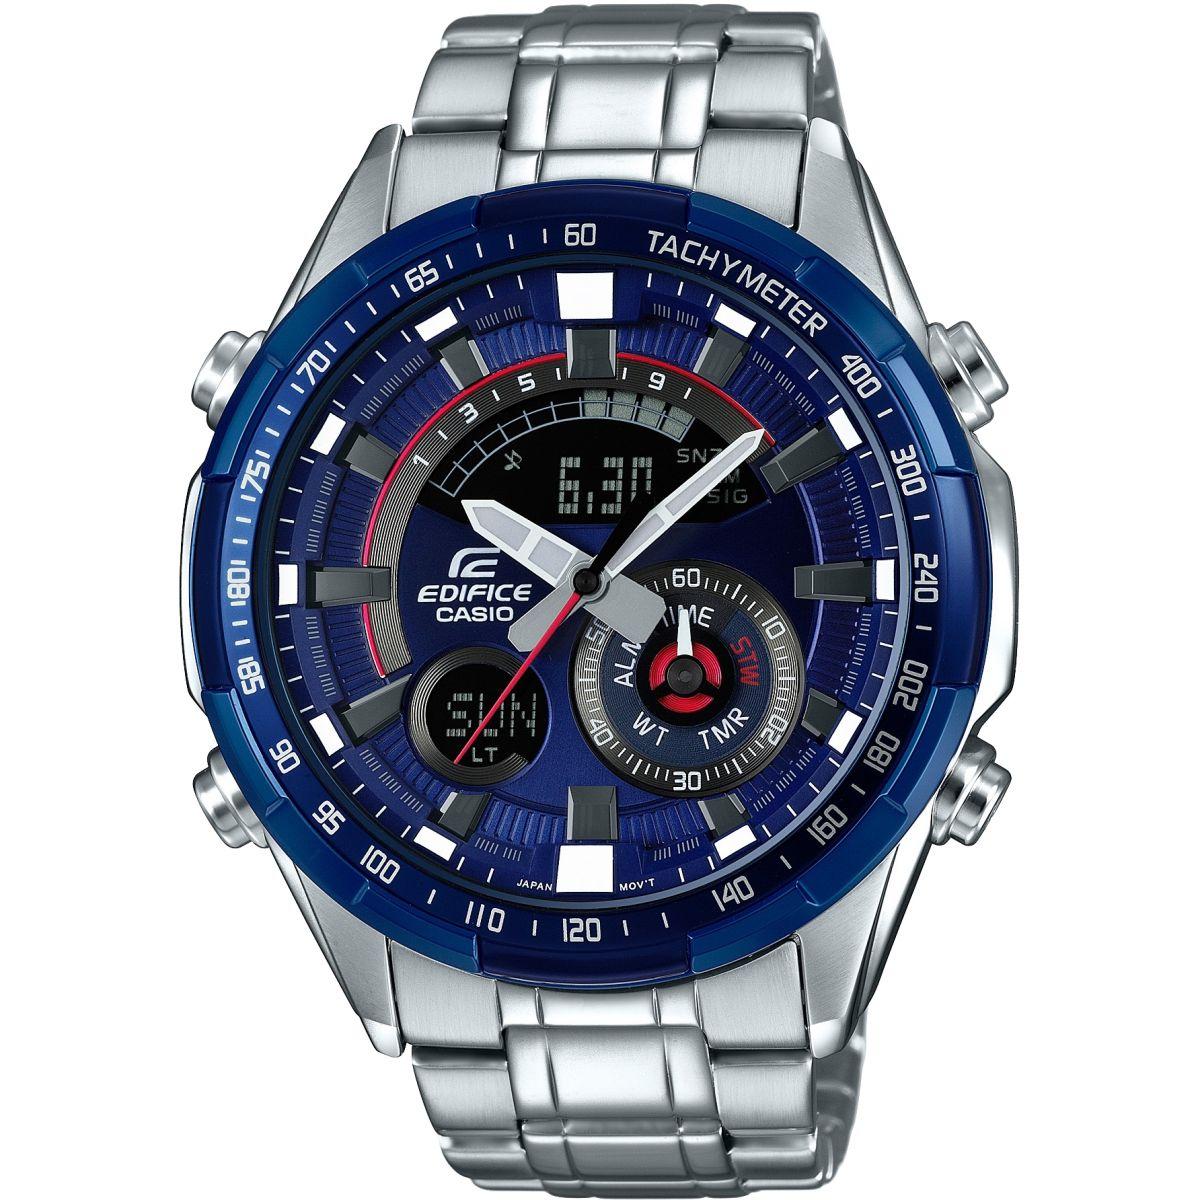 Casio Edifice Mens Watch ERA-600RR-2AVUEF £89.00 @ Amazon